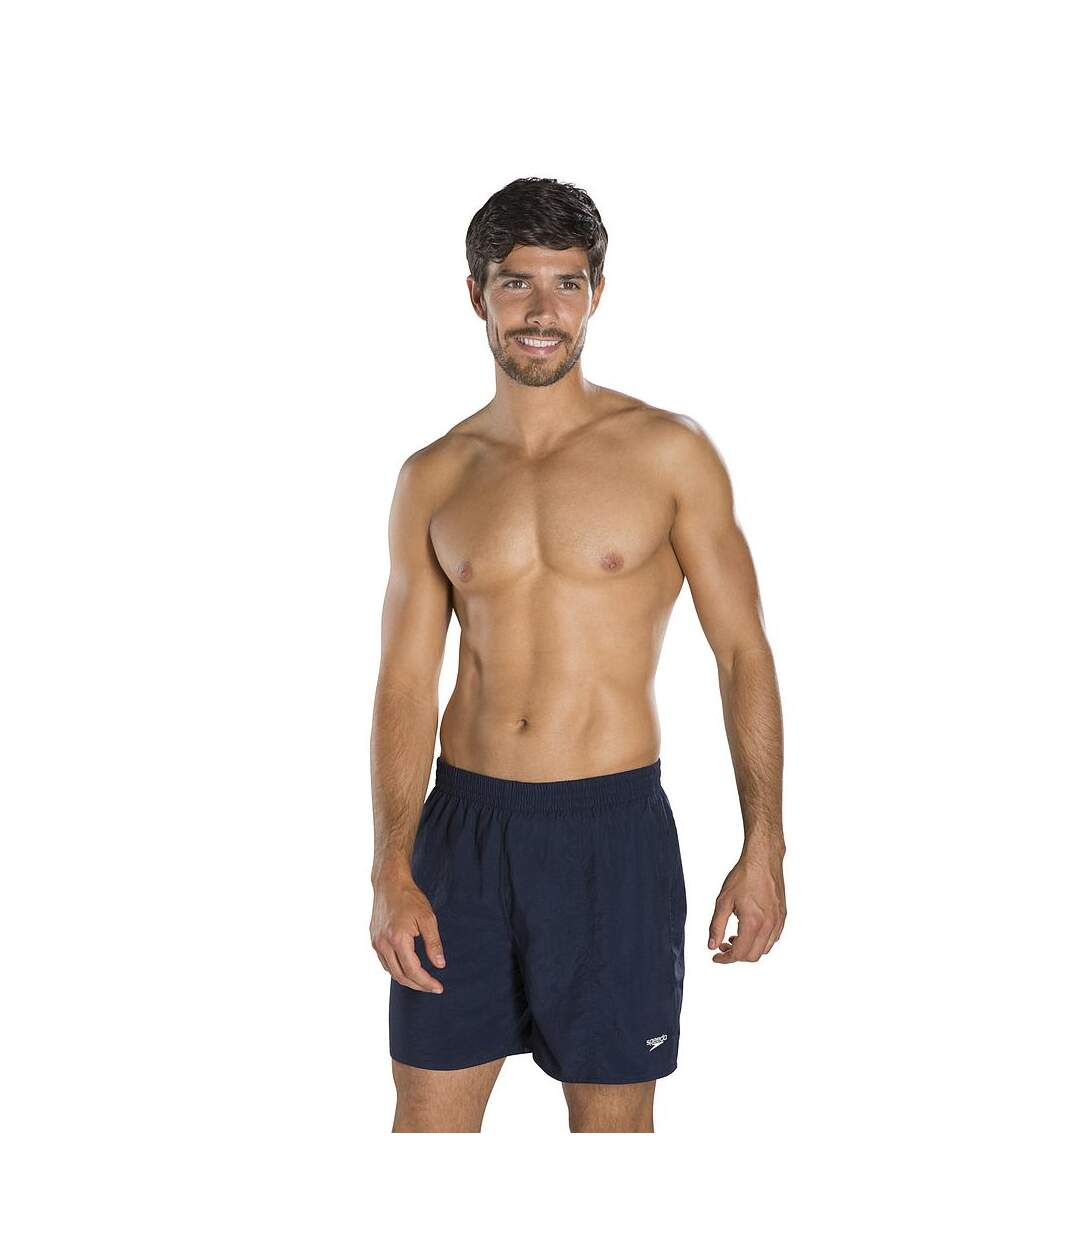 Speedo Mens Leisure Shorts (Navy) - UTRD714